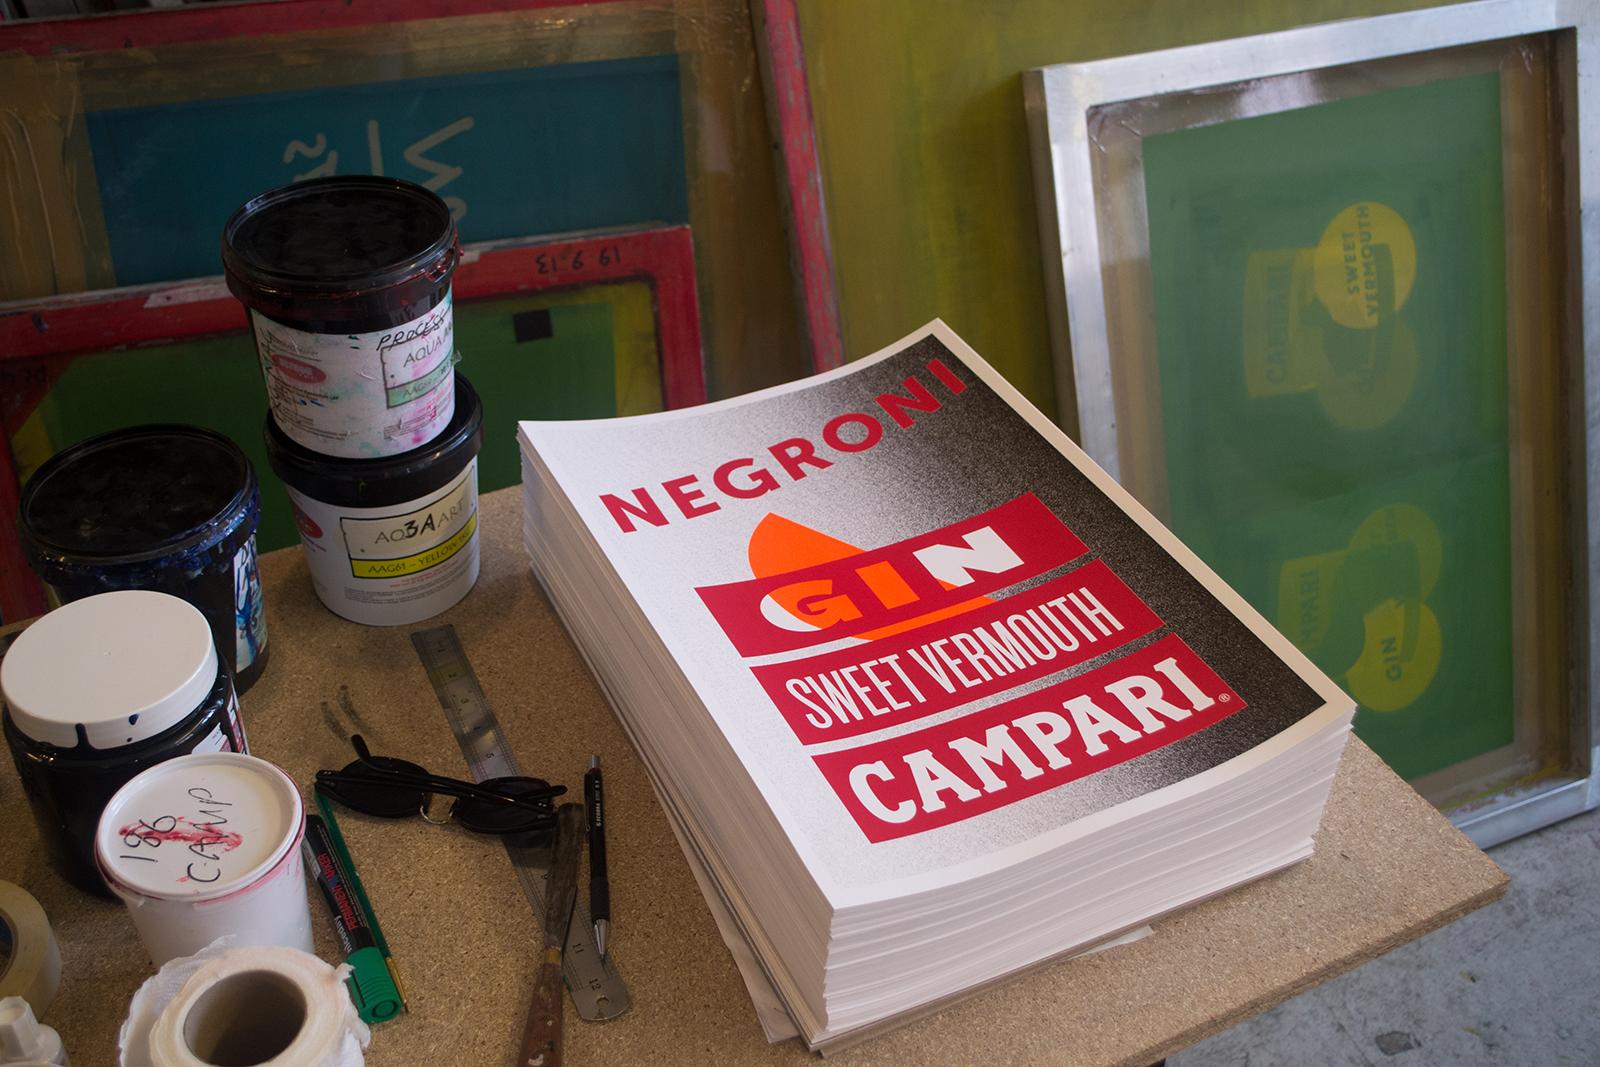 Campari Negroni Silkscreen   By James-Lee Duffy